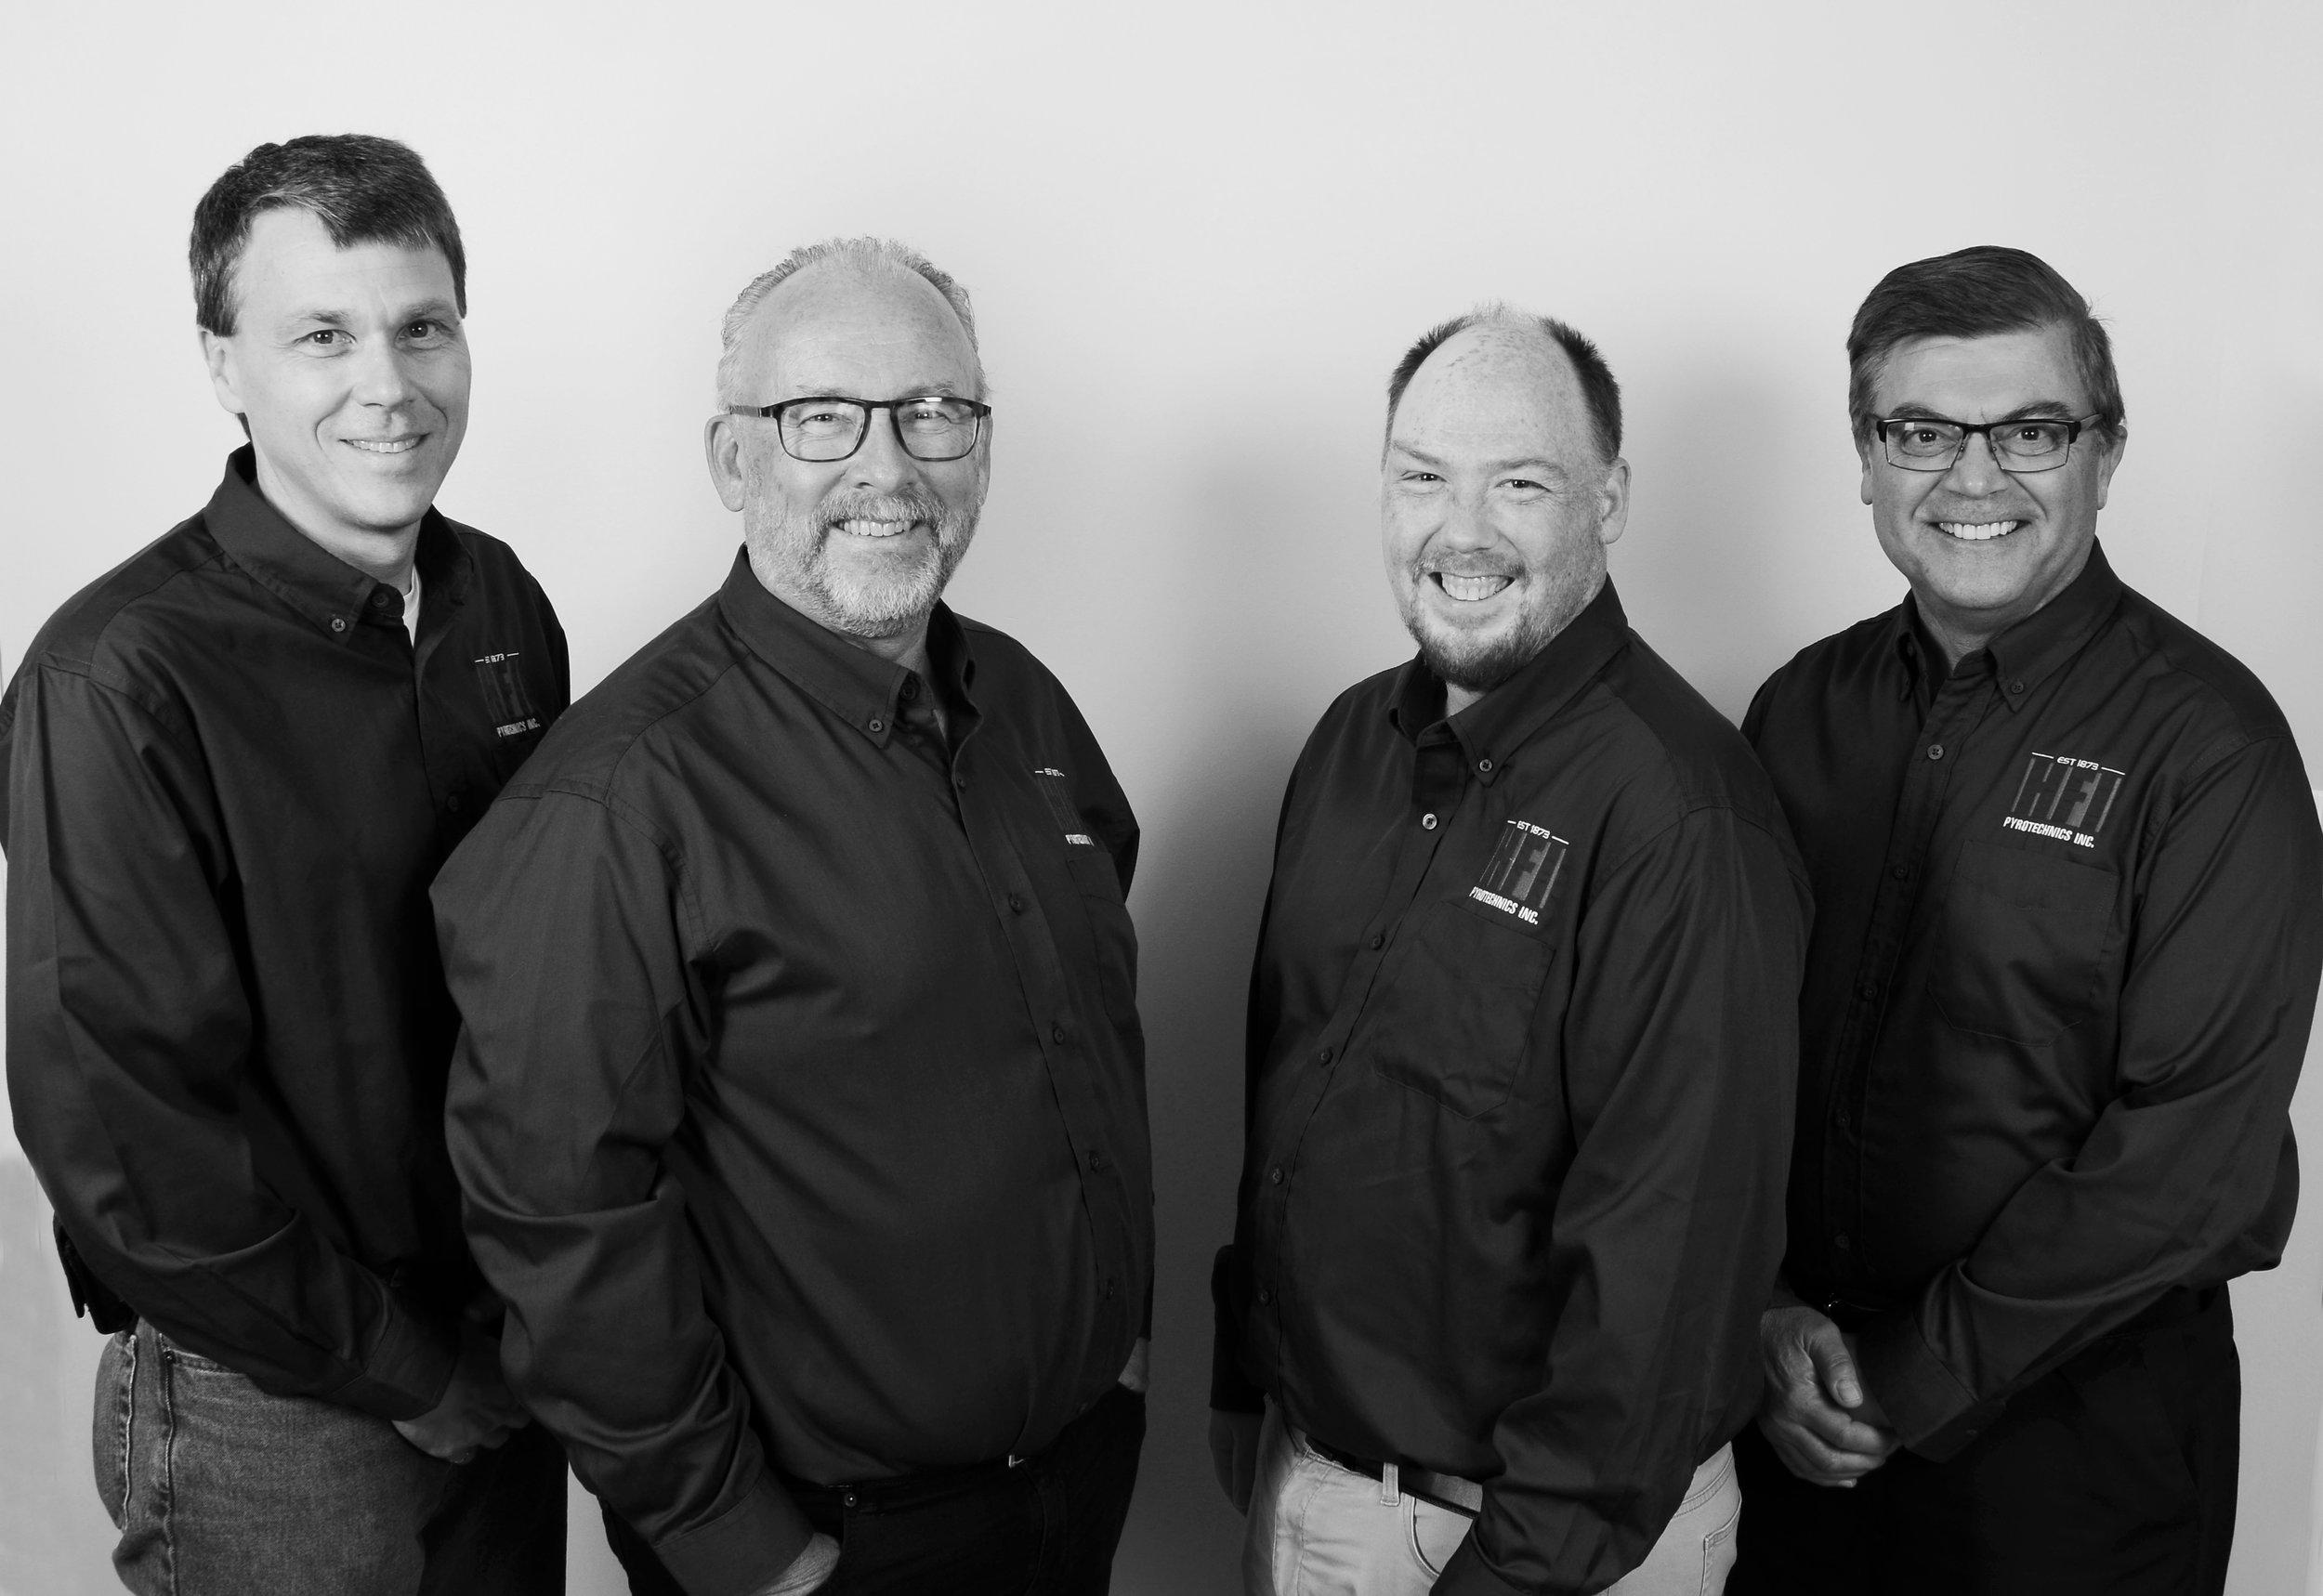 L-R John Houston, John Witherspoon, Marcus Shaw and Bob Jurkewycz